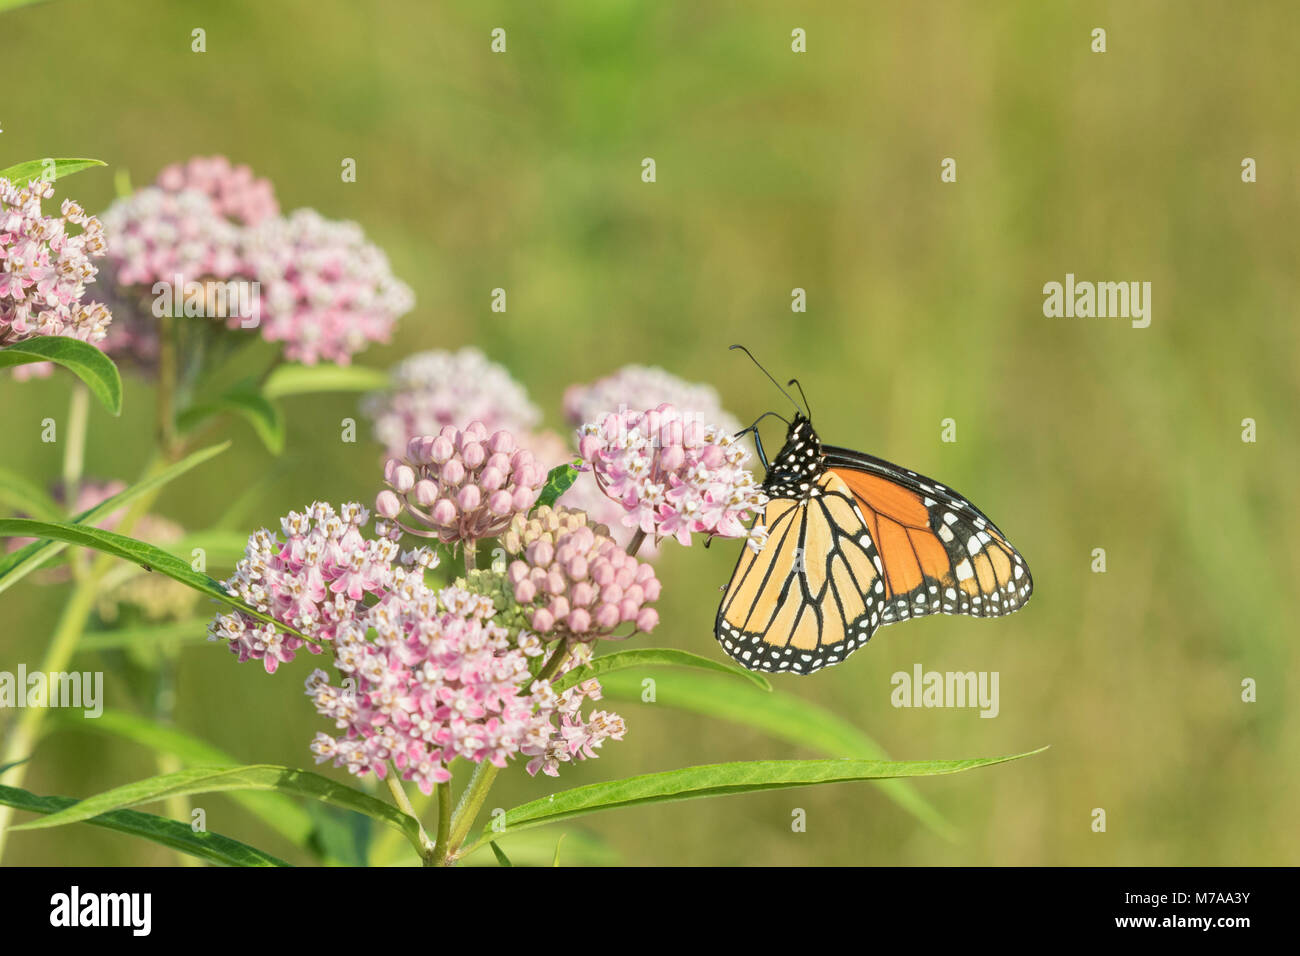 03536-05909 monarca (Danaus plexippus) en el Pantano (Asclepias Asclepias incarnata) Marion Co. IL Foto de stock